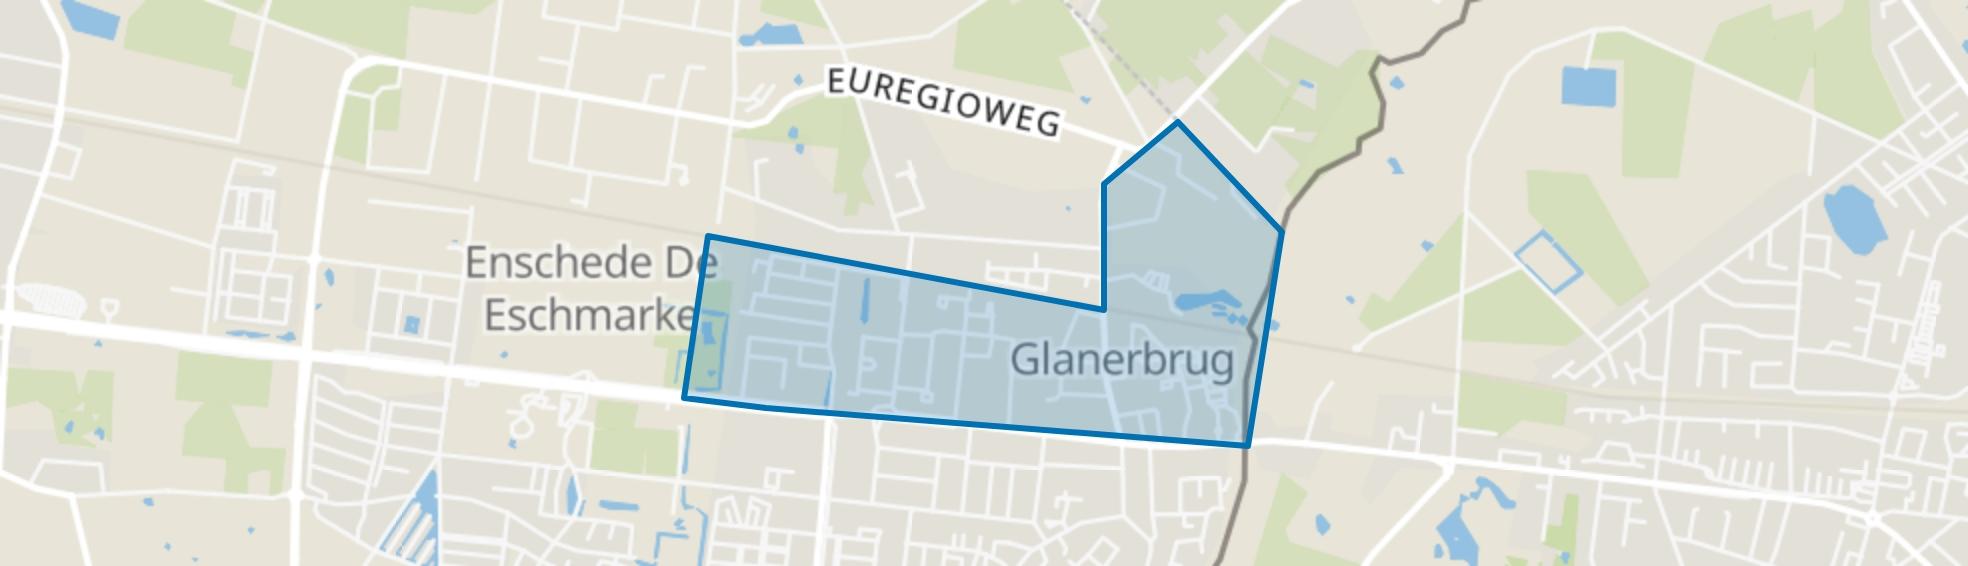 Bentveld-Bultserve, Enschede map